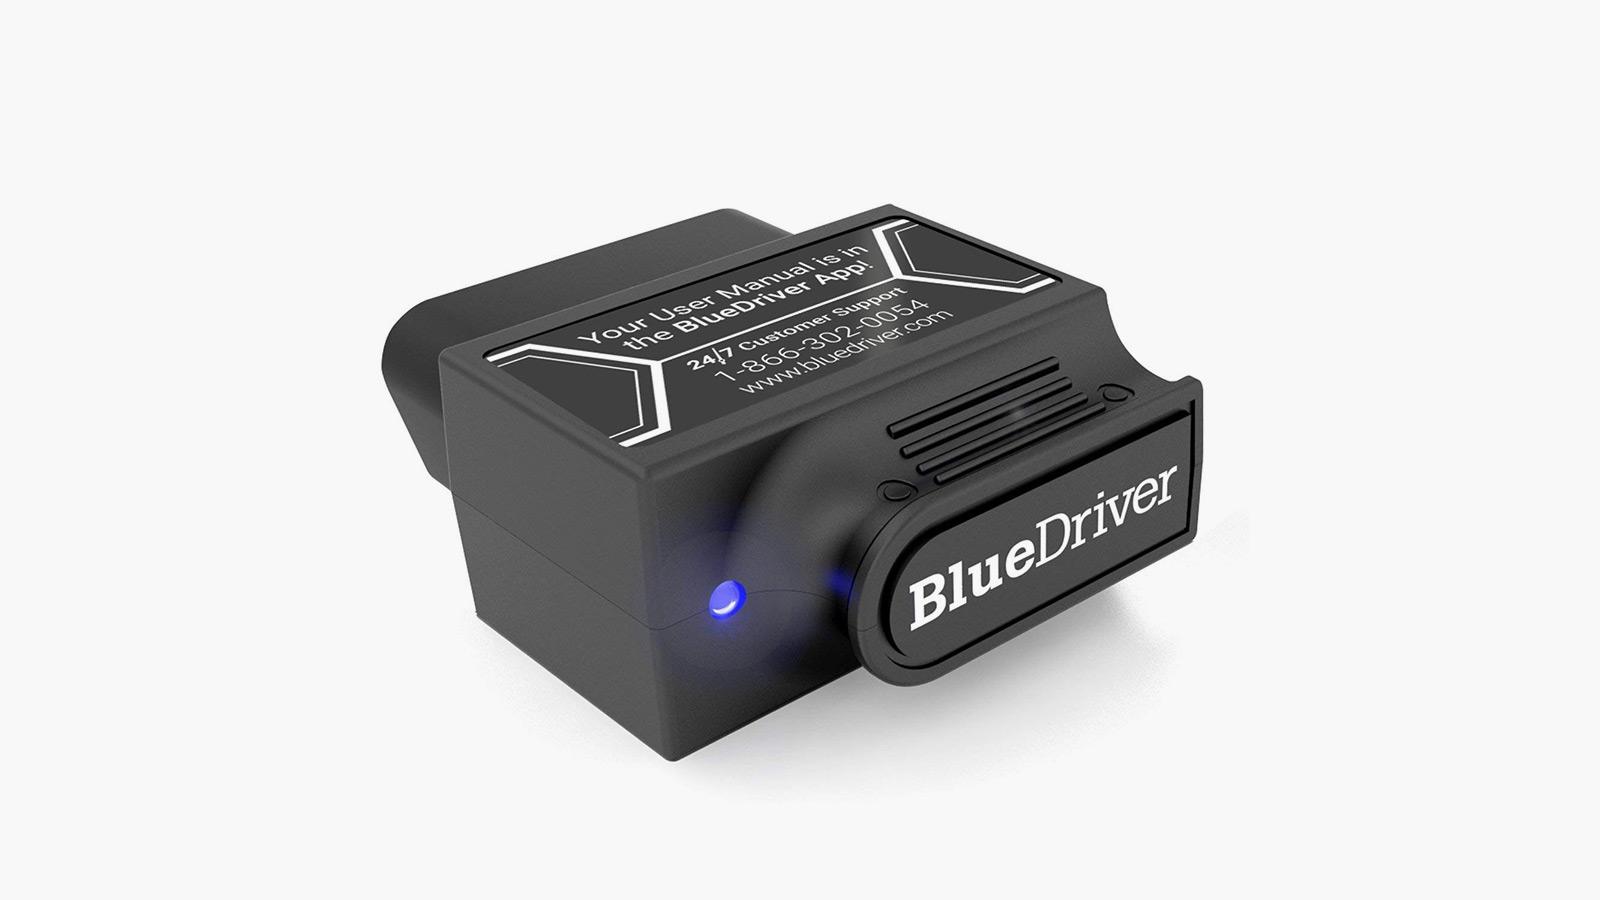 BlueDriver Bluetooth Pro OBDII Scan Tool